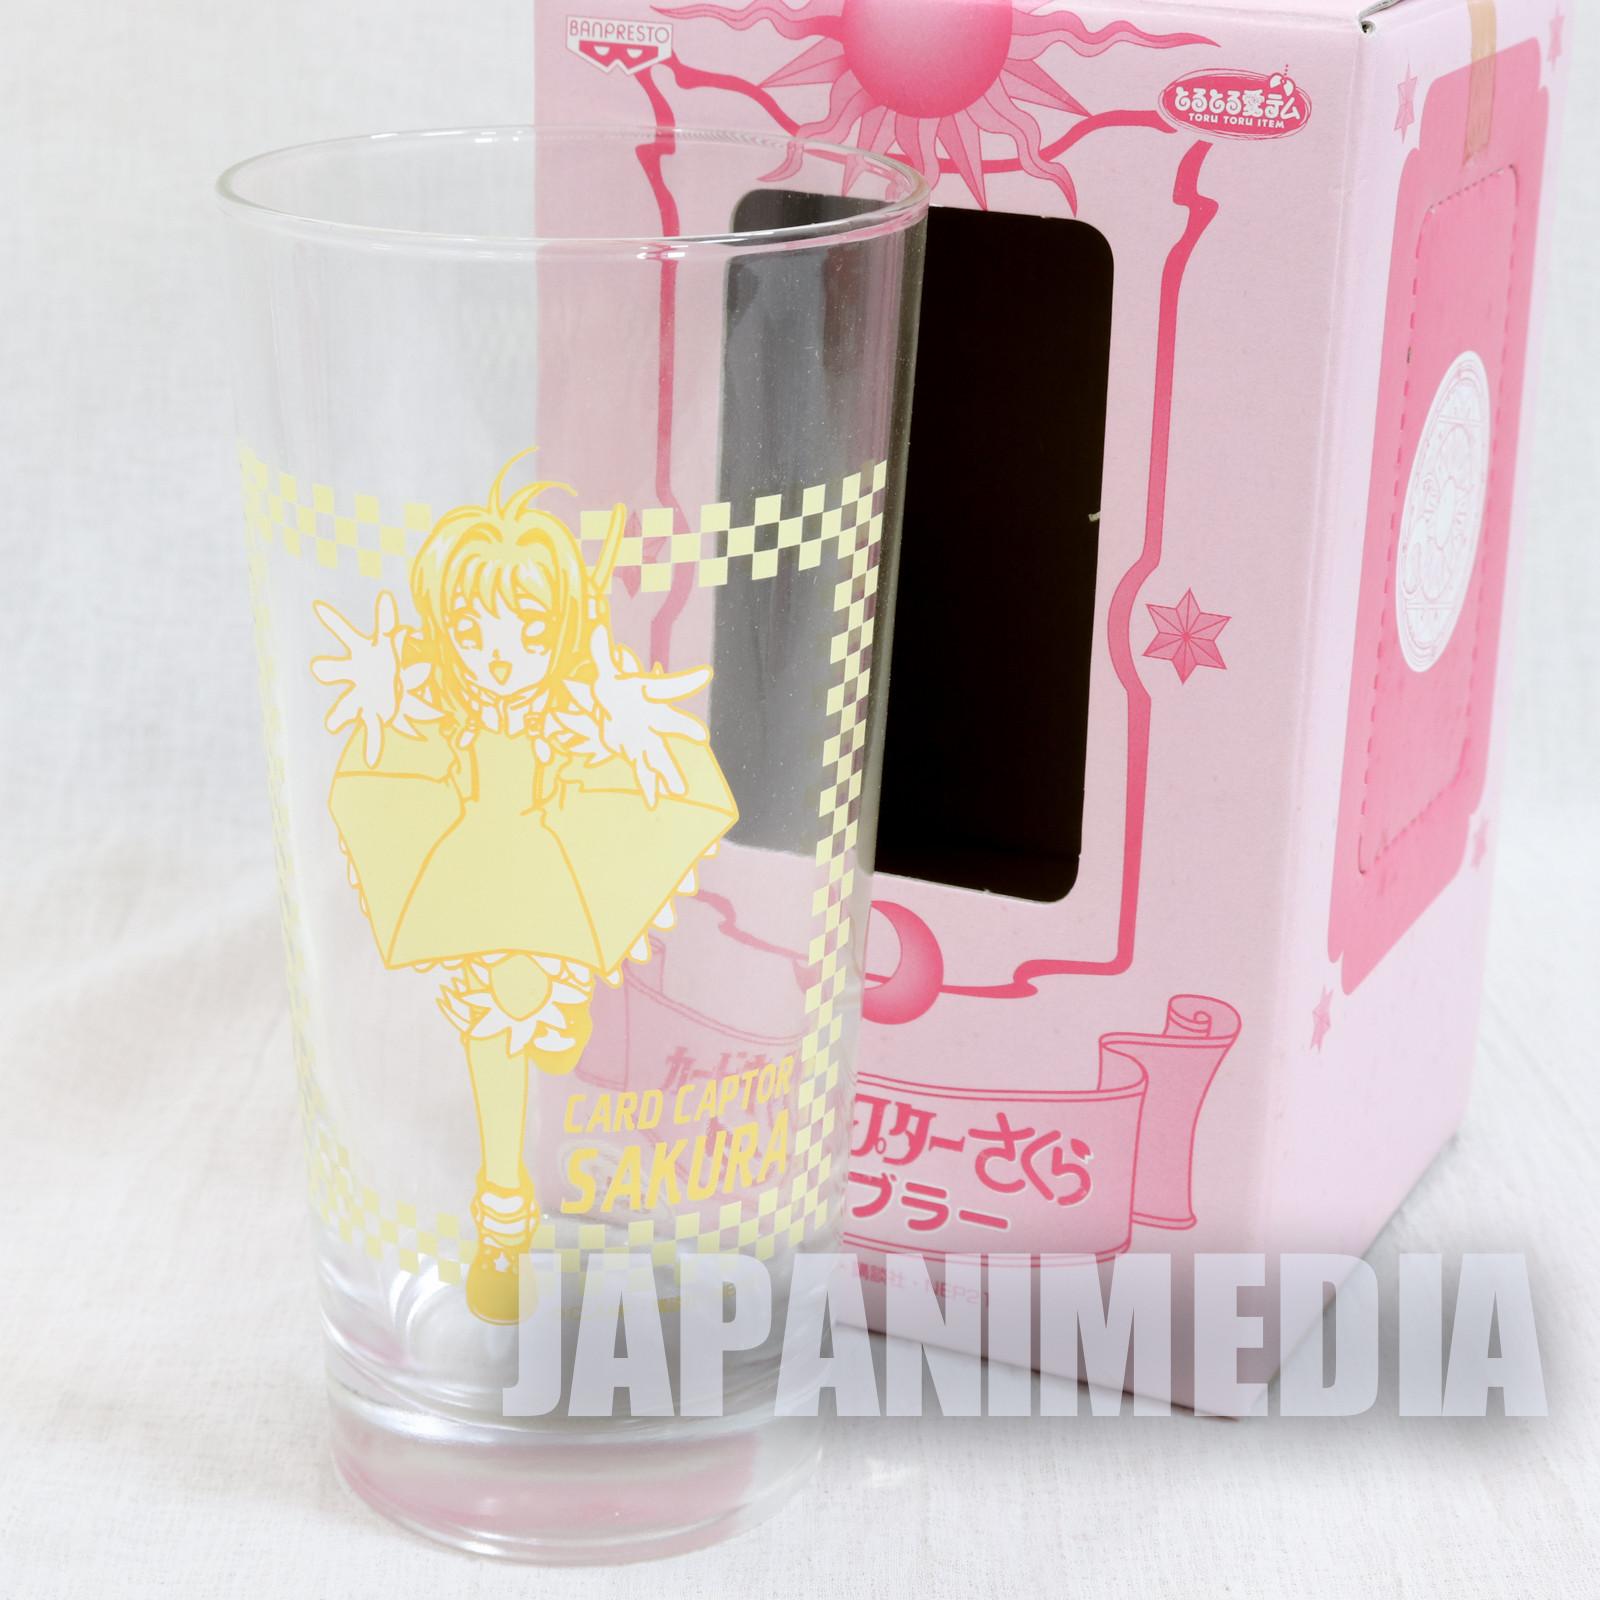 Cardcaptor Sakura Tall Glass Yellow Banpresto CLAMP JAPAN ANIME MANGA